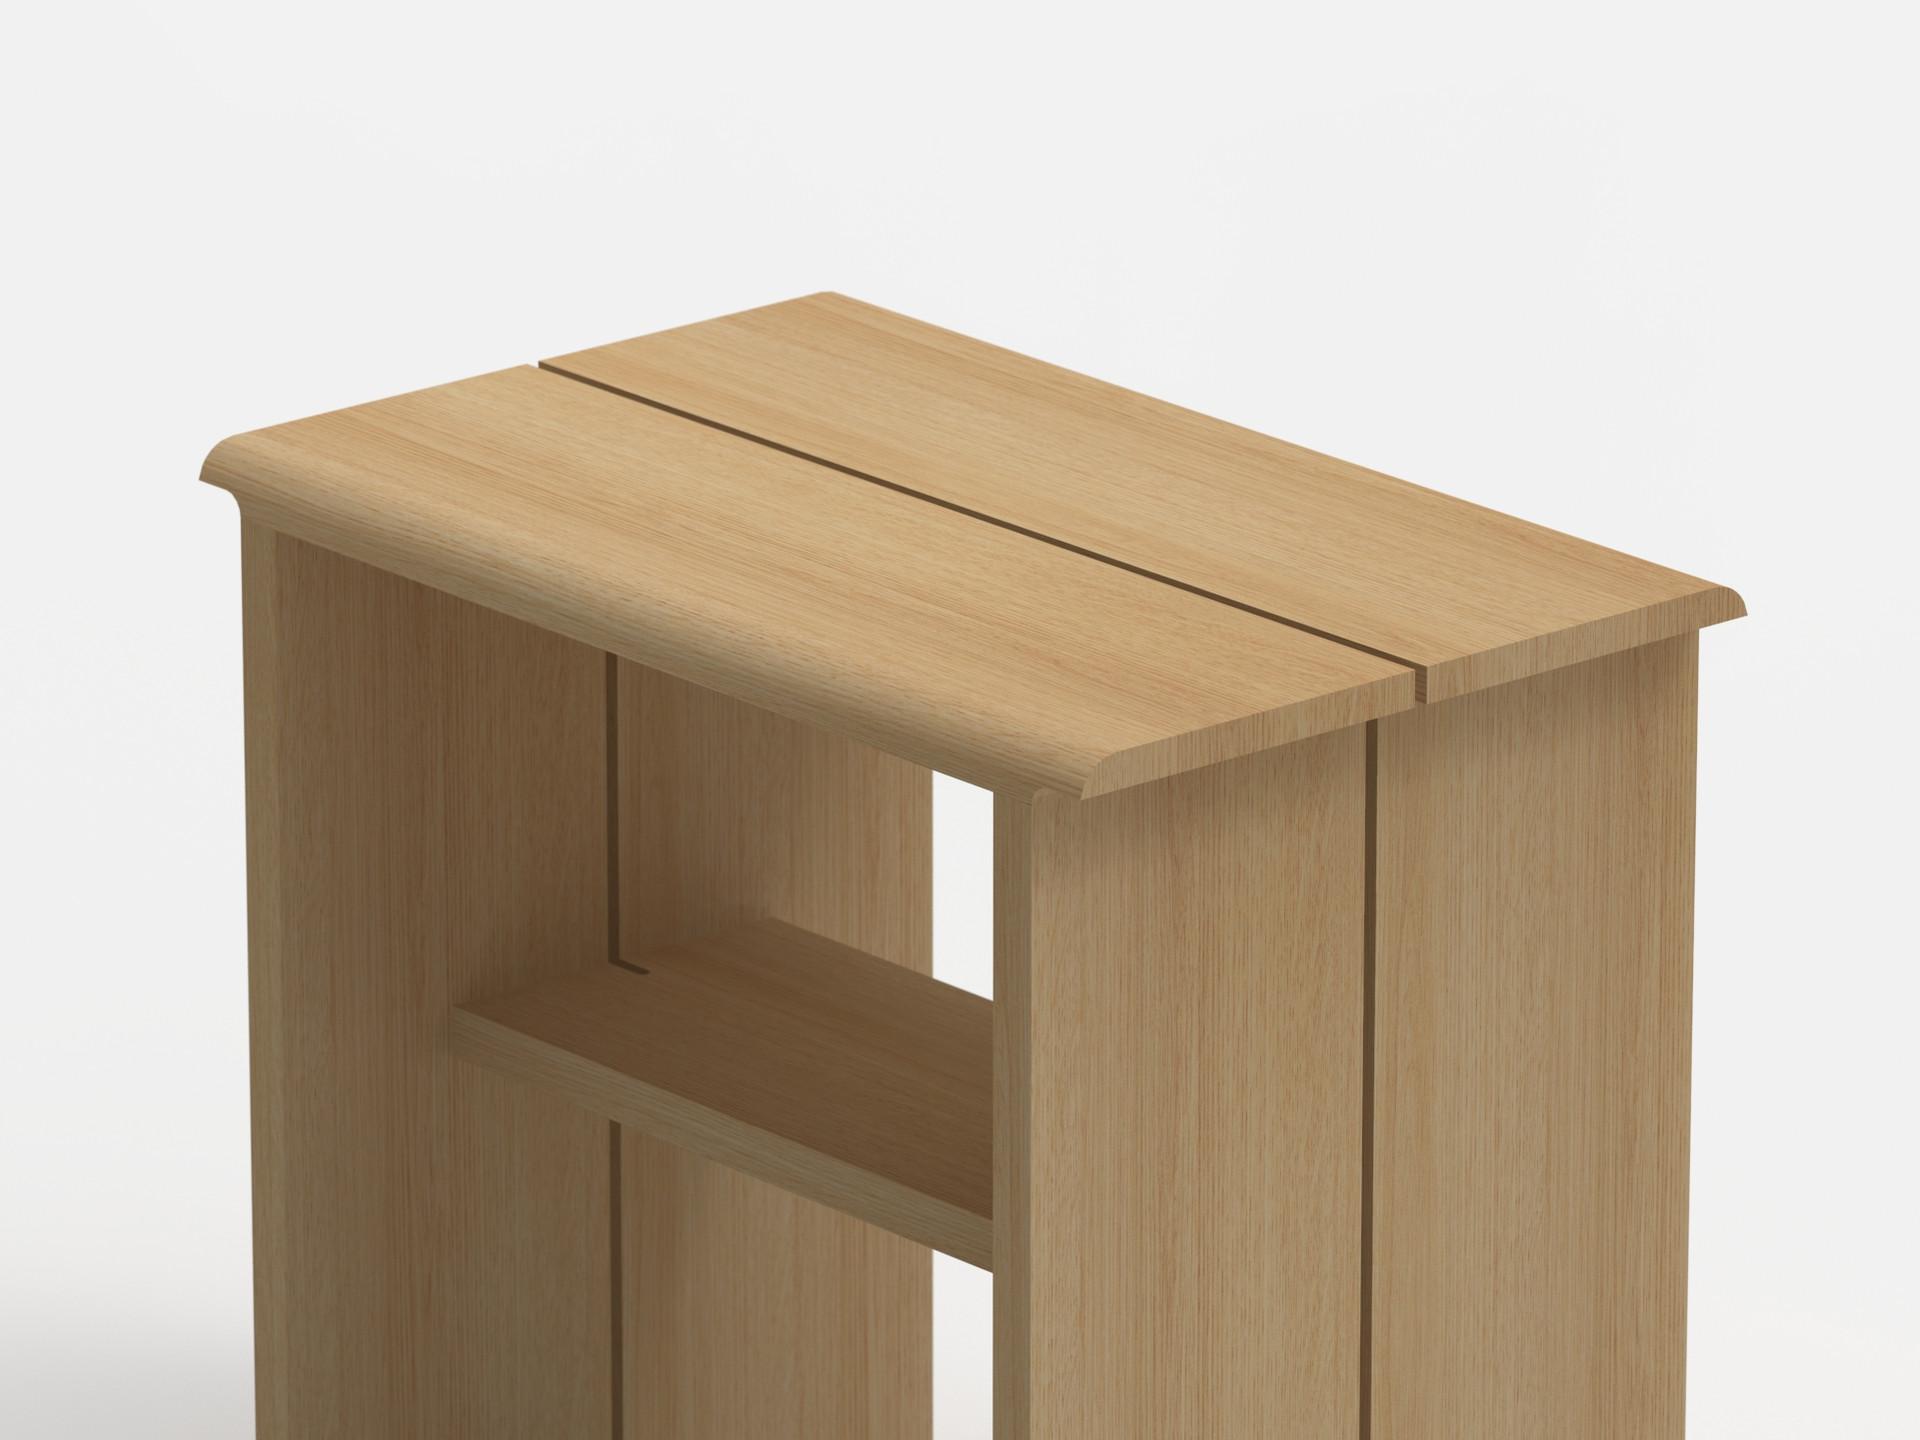 200516_stool_4.jpg